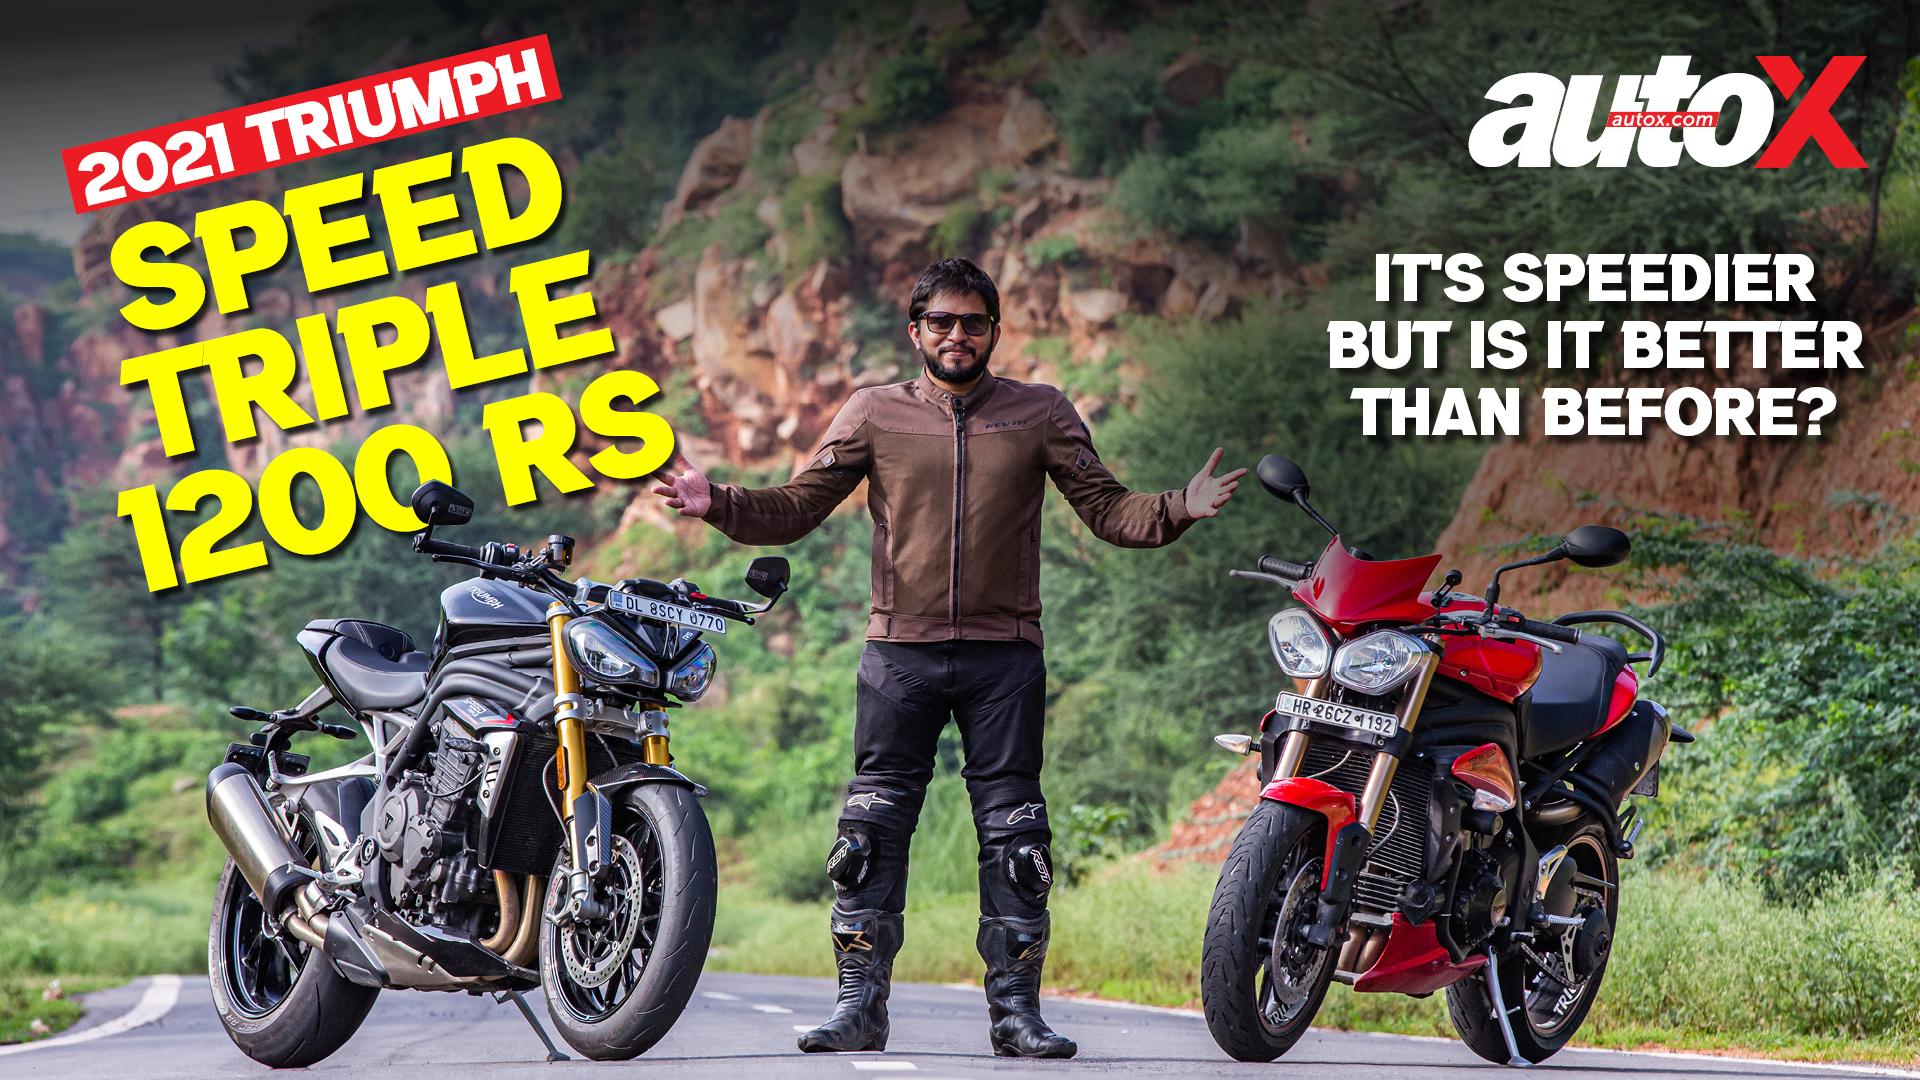 2021 Triumph Speed Triple 1200 RS: The Original Hooligan goes hyper! | Review | autoX